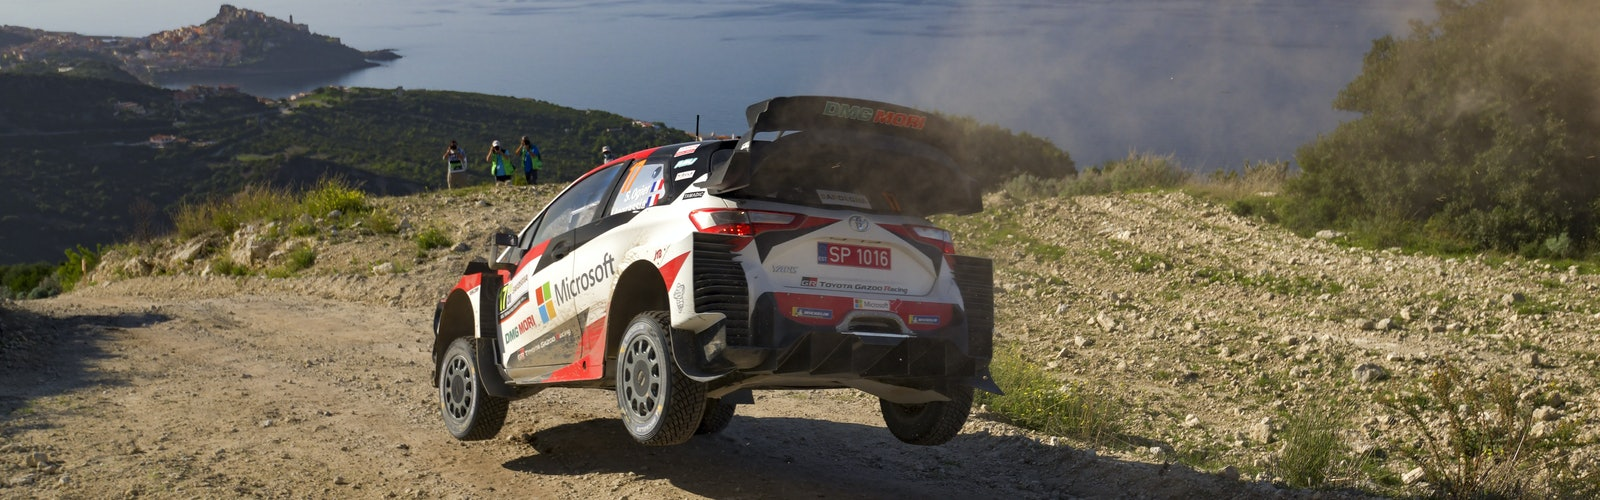 WRC_2020_Rd.6_108